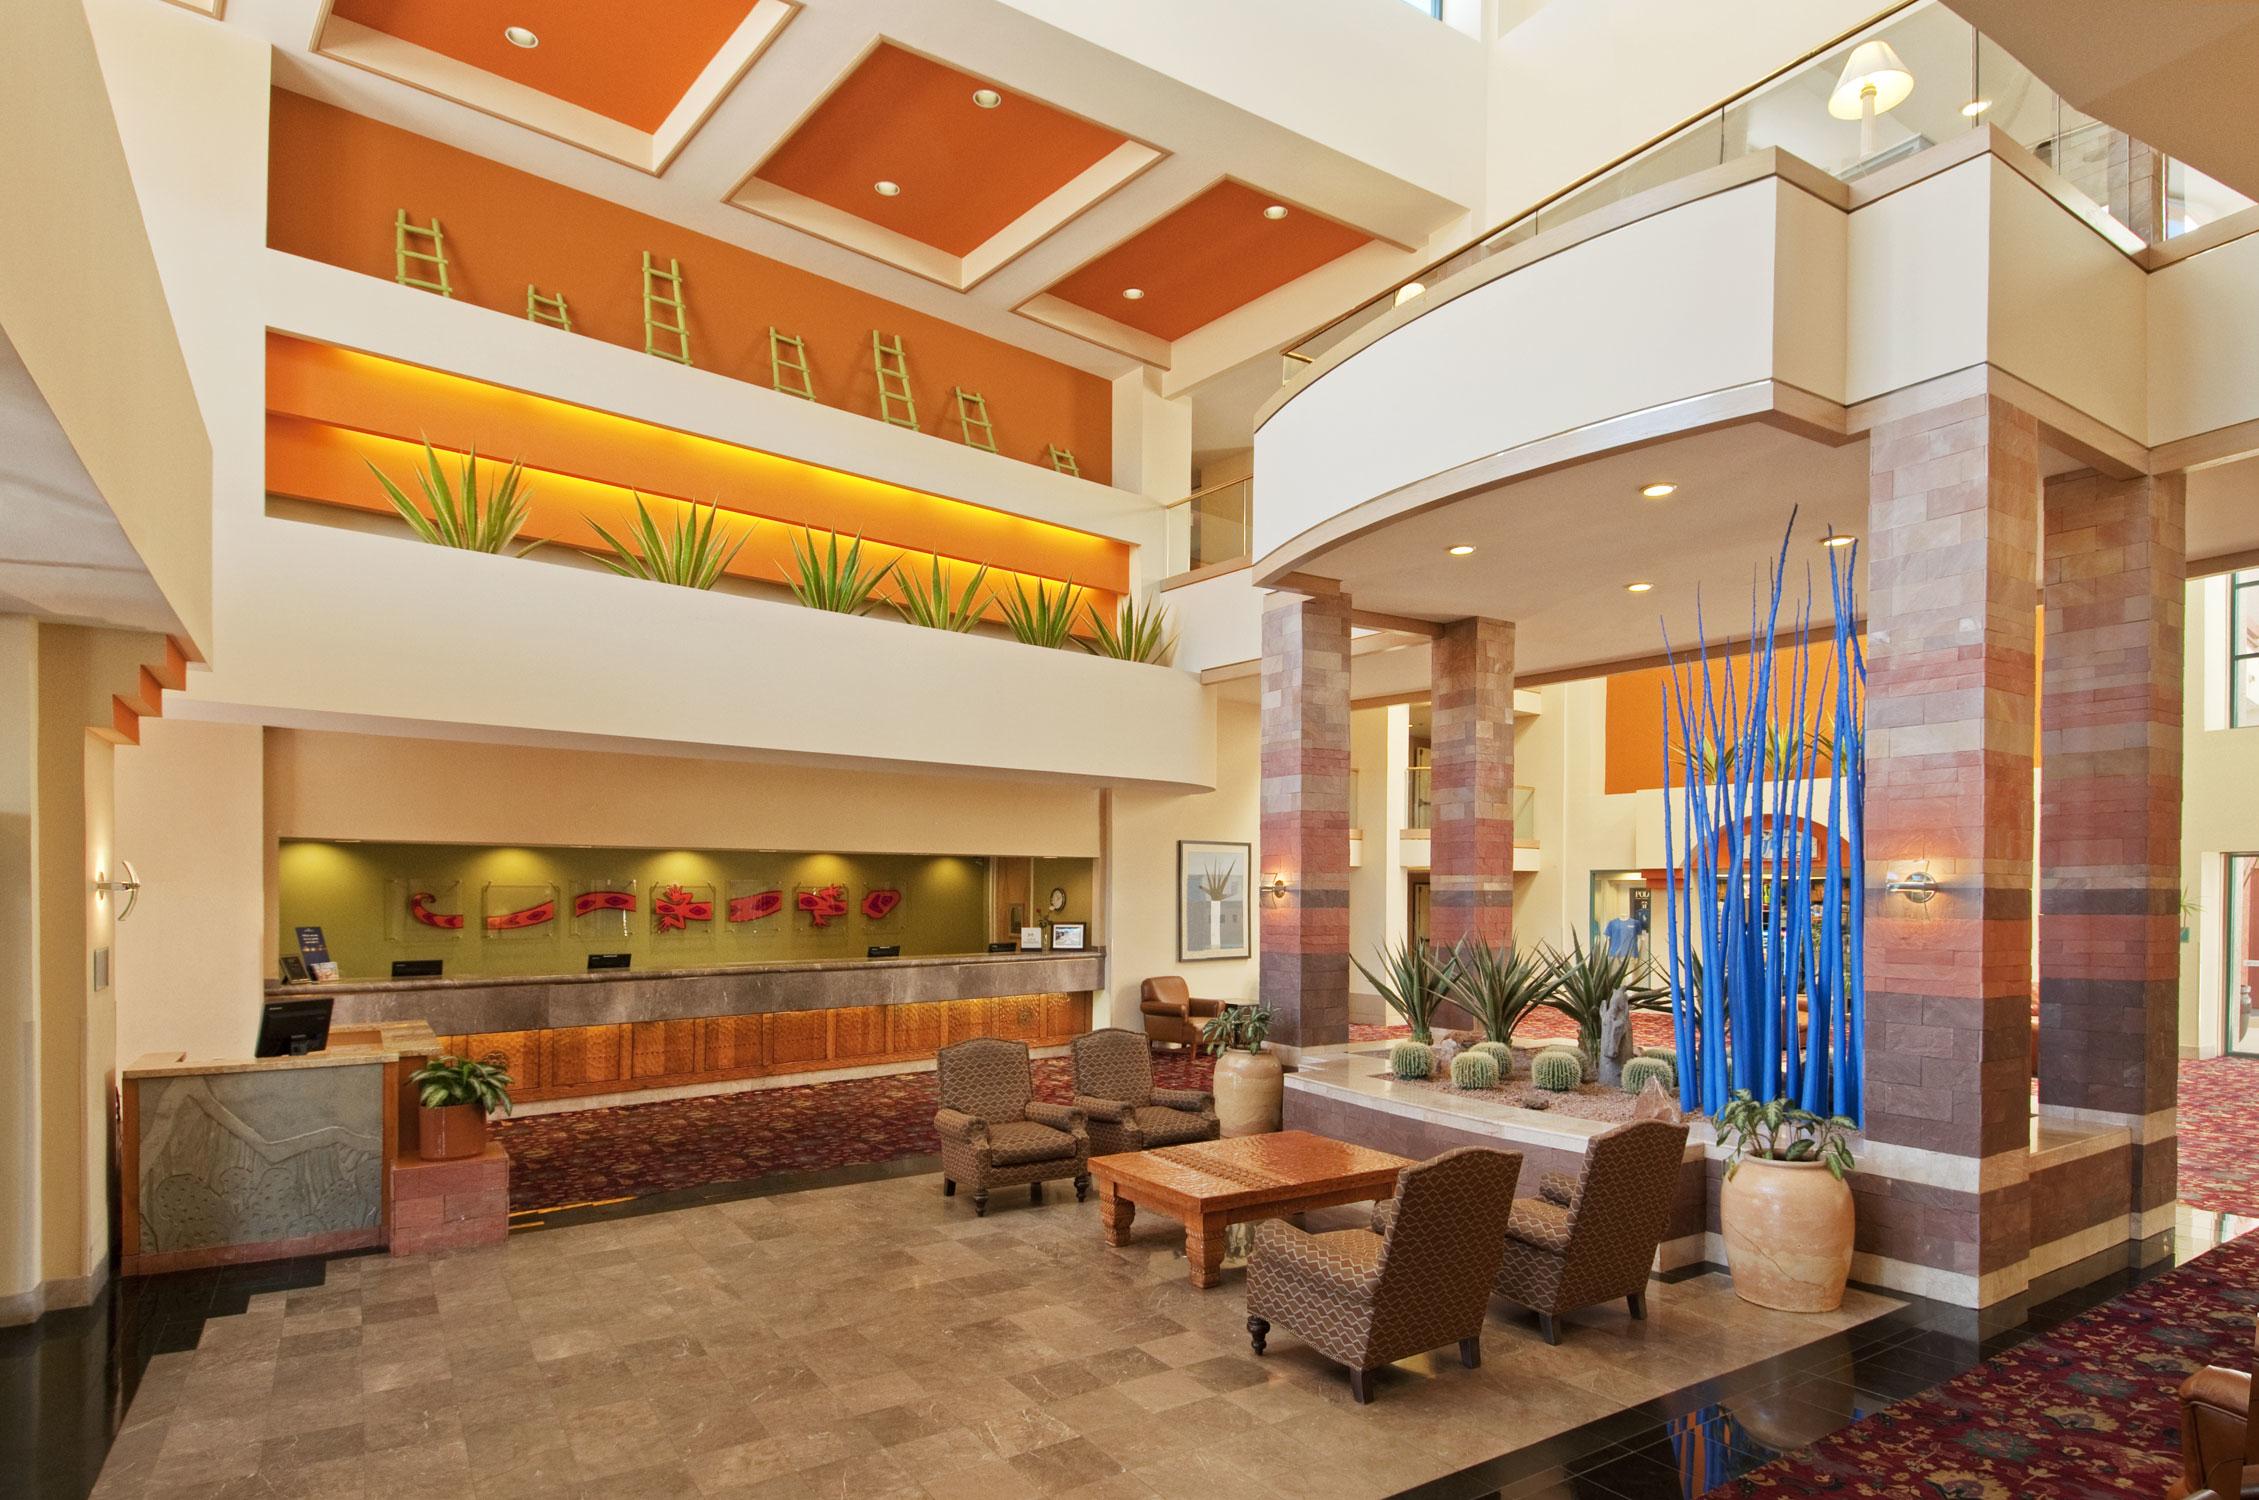 Restaurants With Meeting Rooms On University In Phoenix